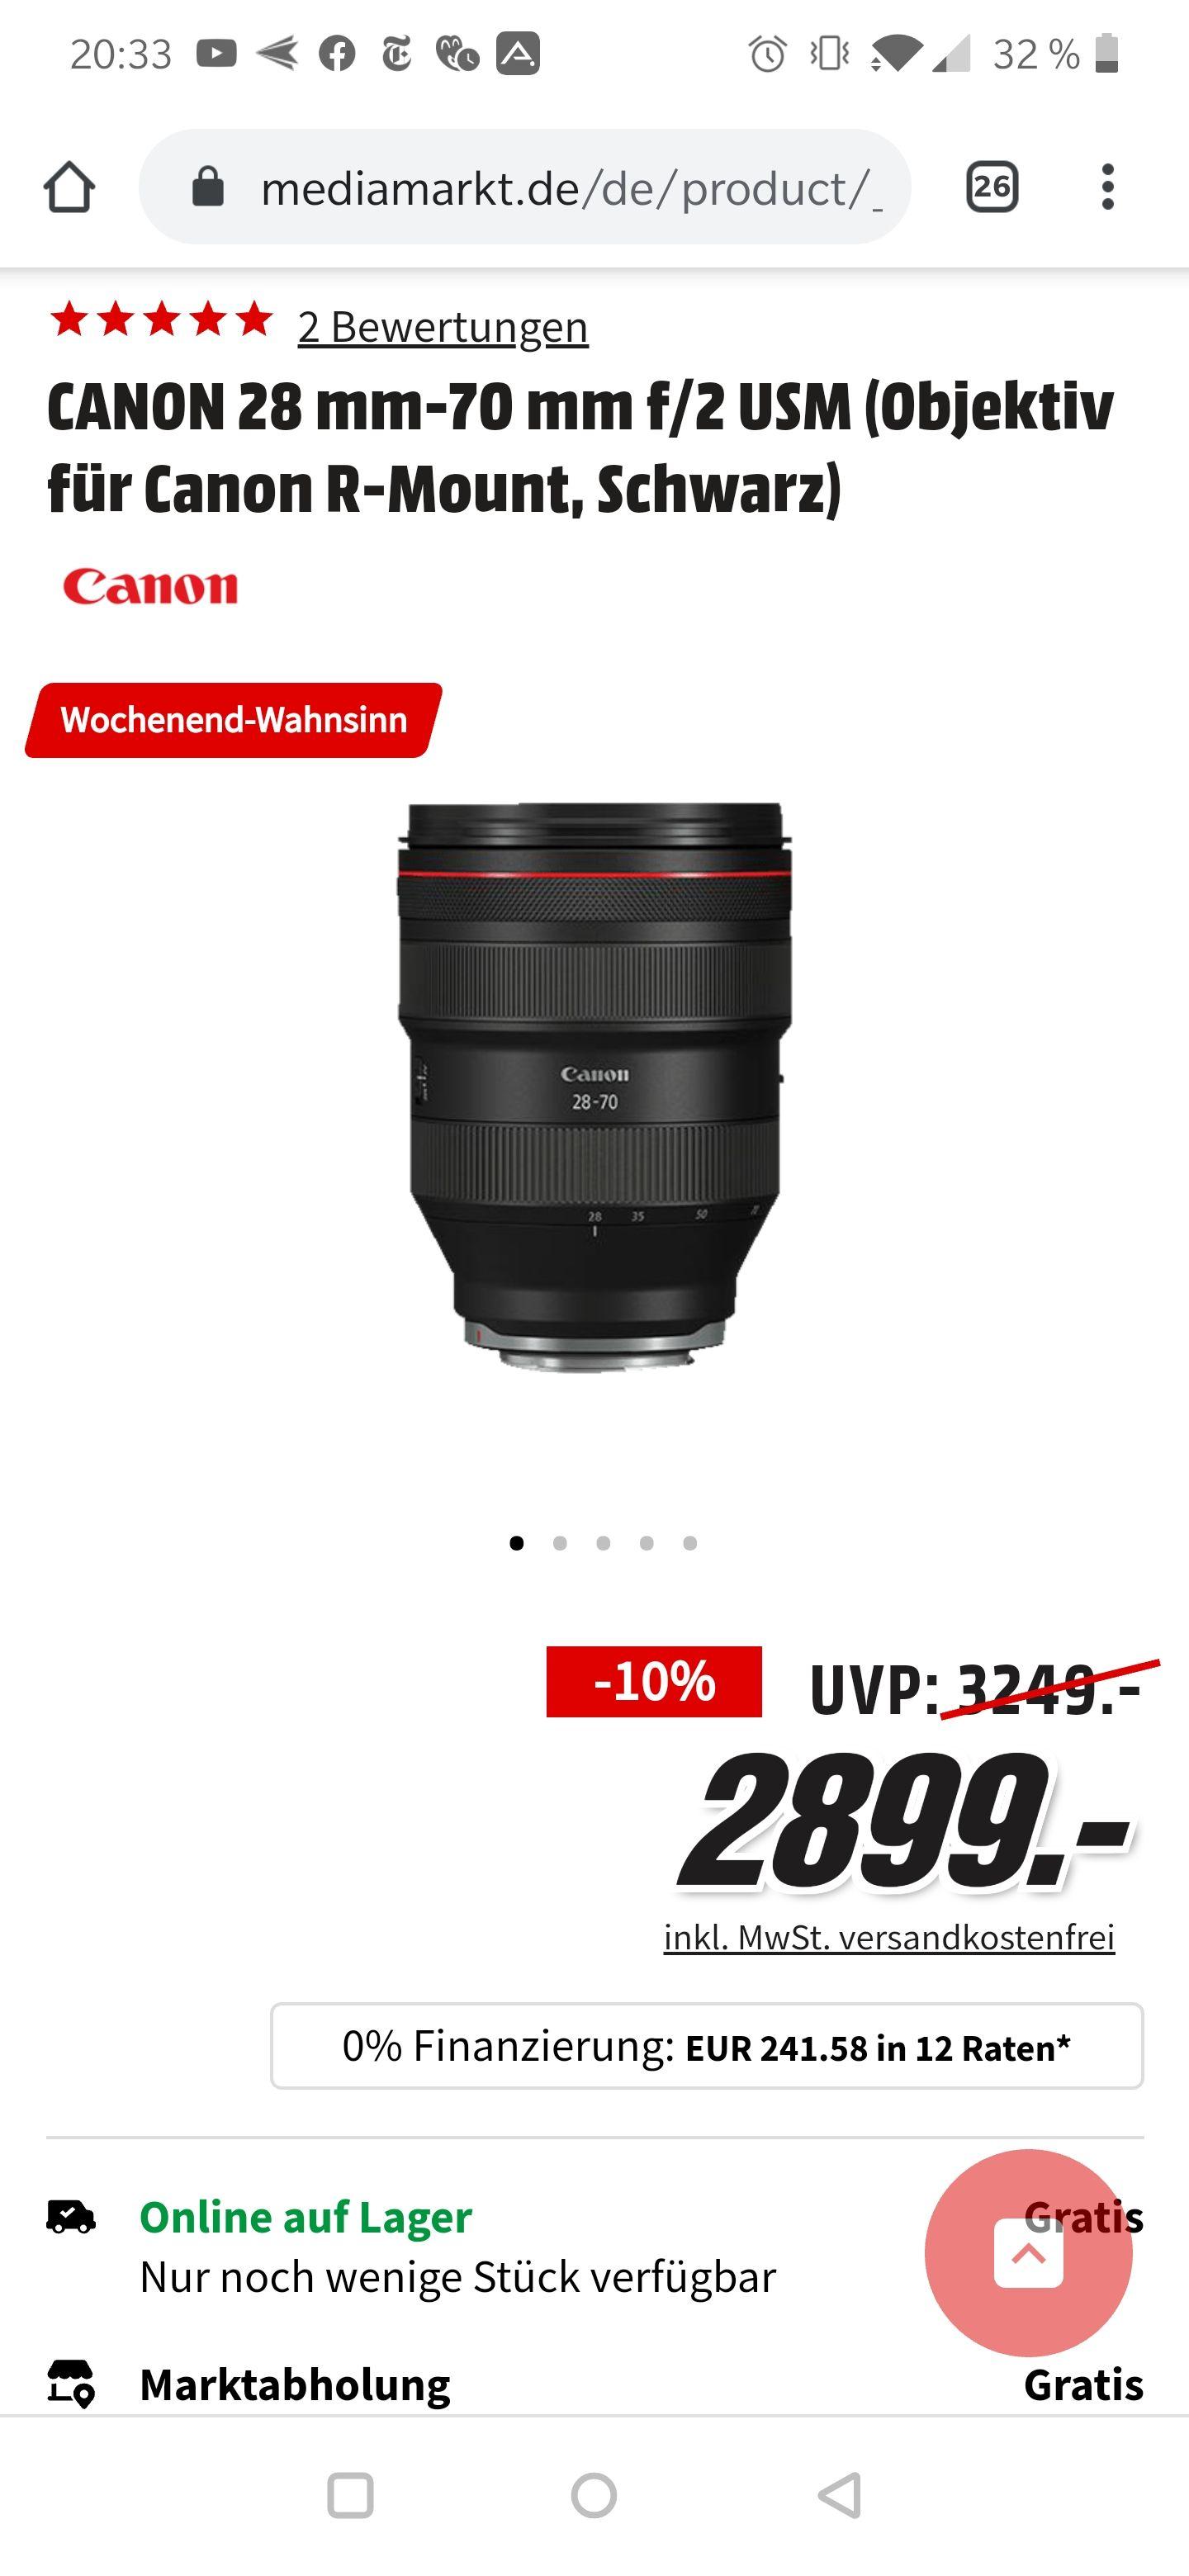 (Mediamarkt/Amazon) CANON 28 mm-70 mm f/2 USM